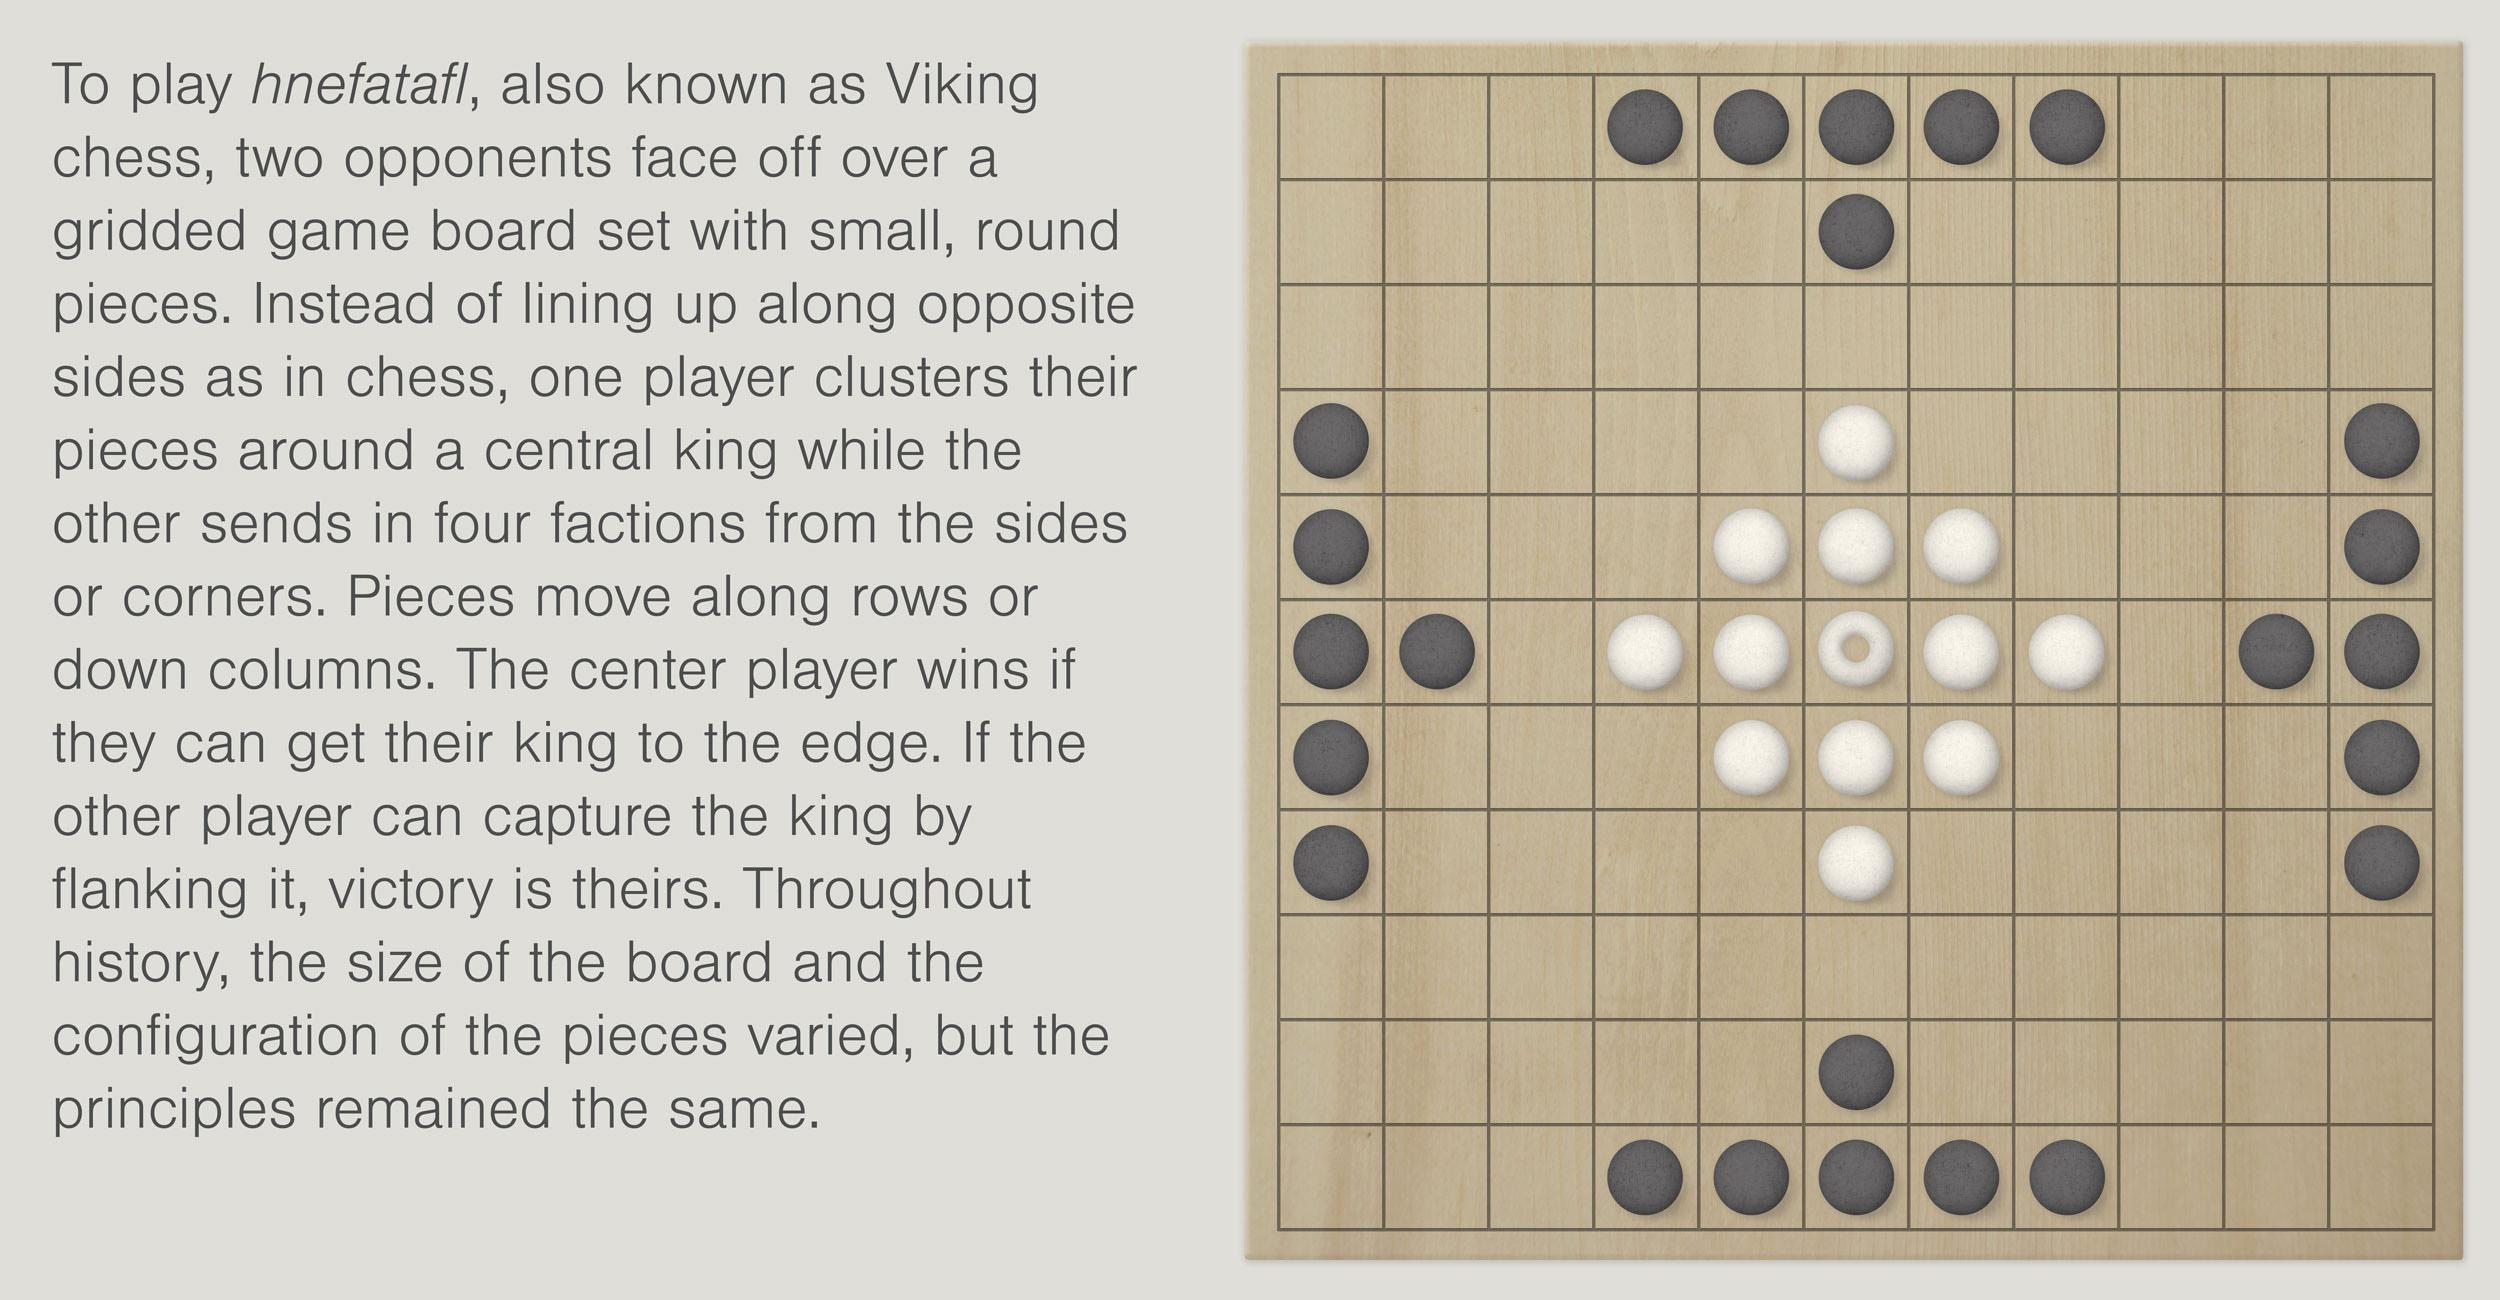 Viking Chess Rules